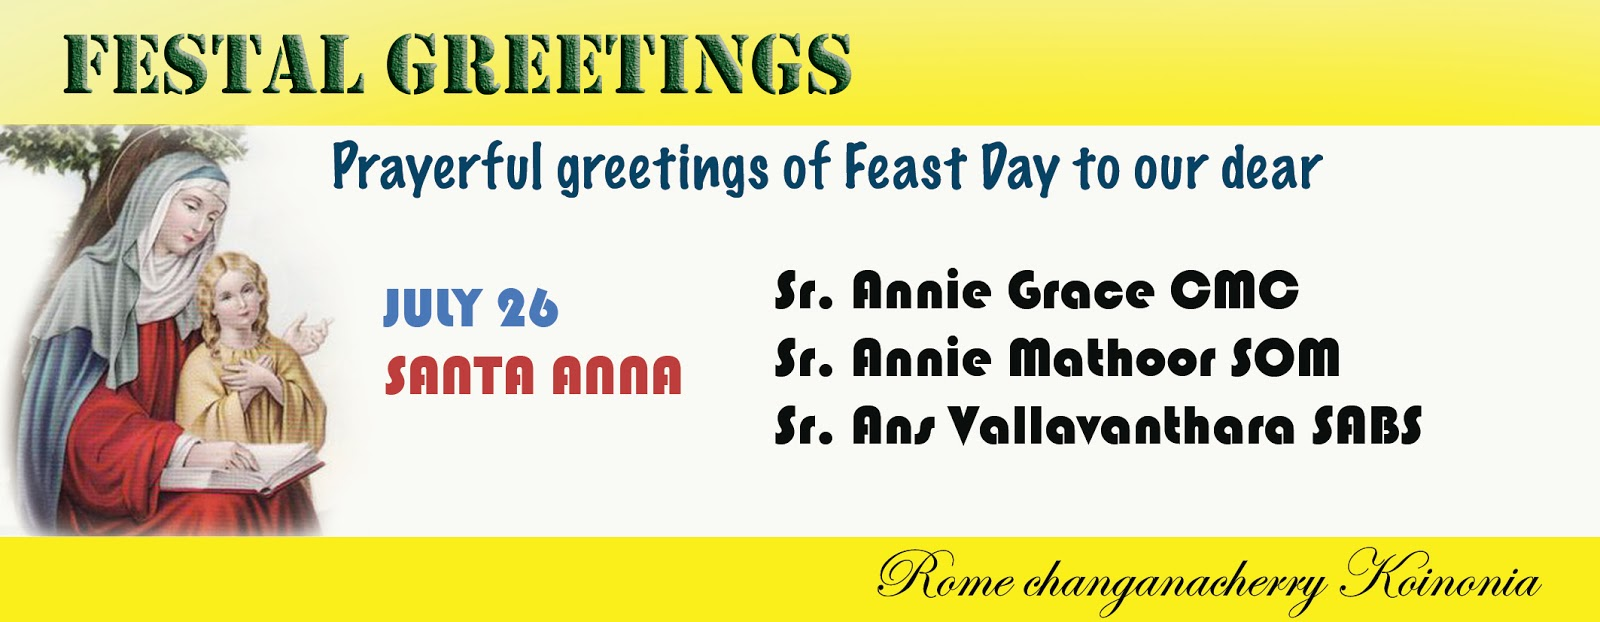 Rome Changanacherry Family July 26 Festal Greetings